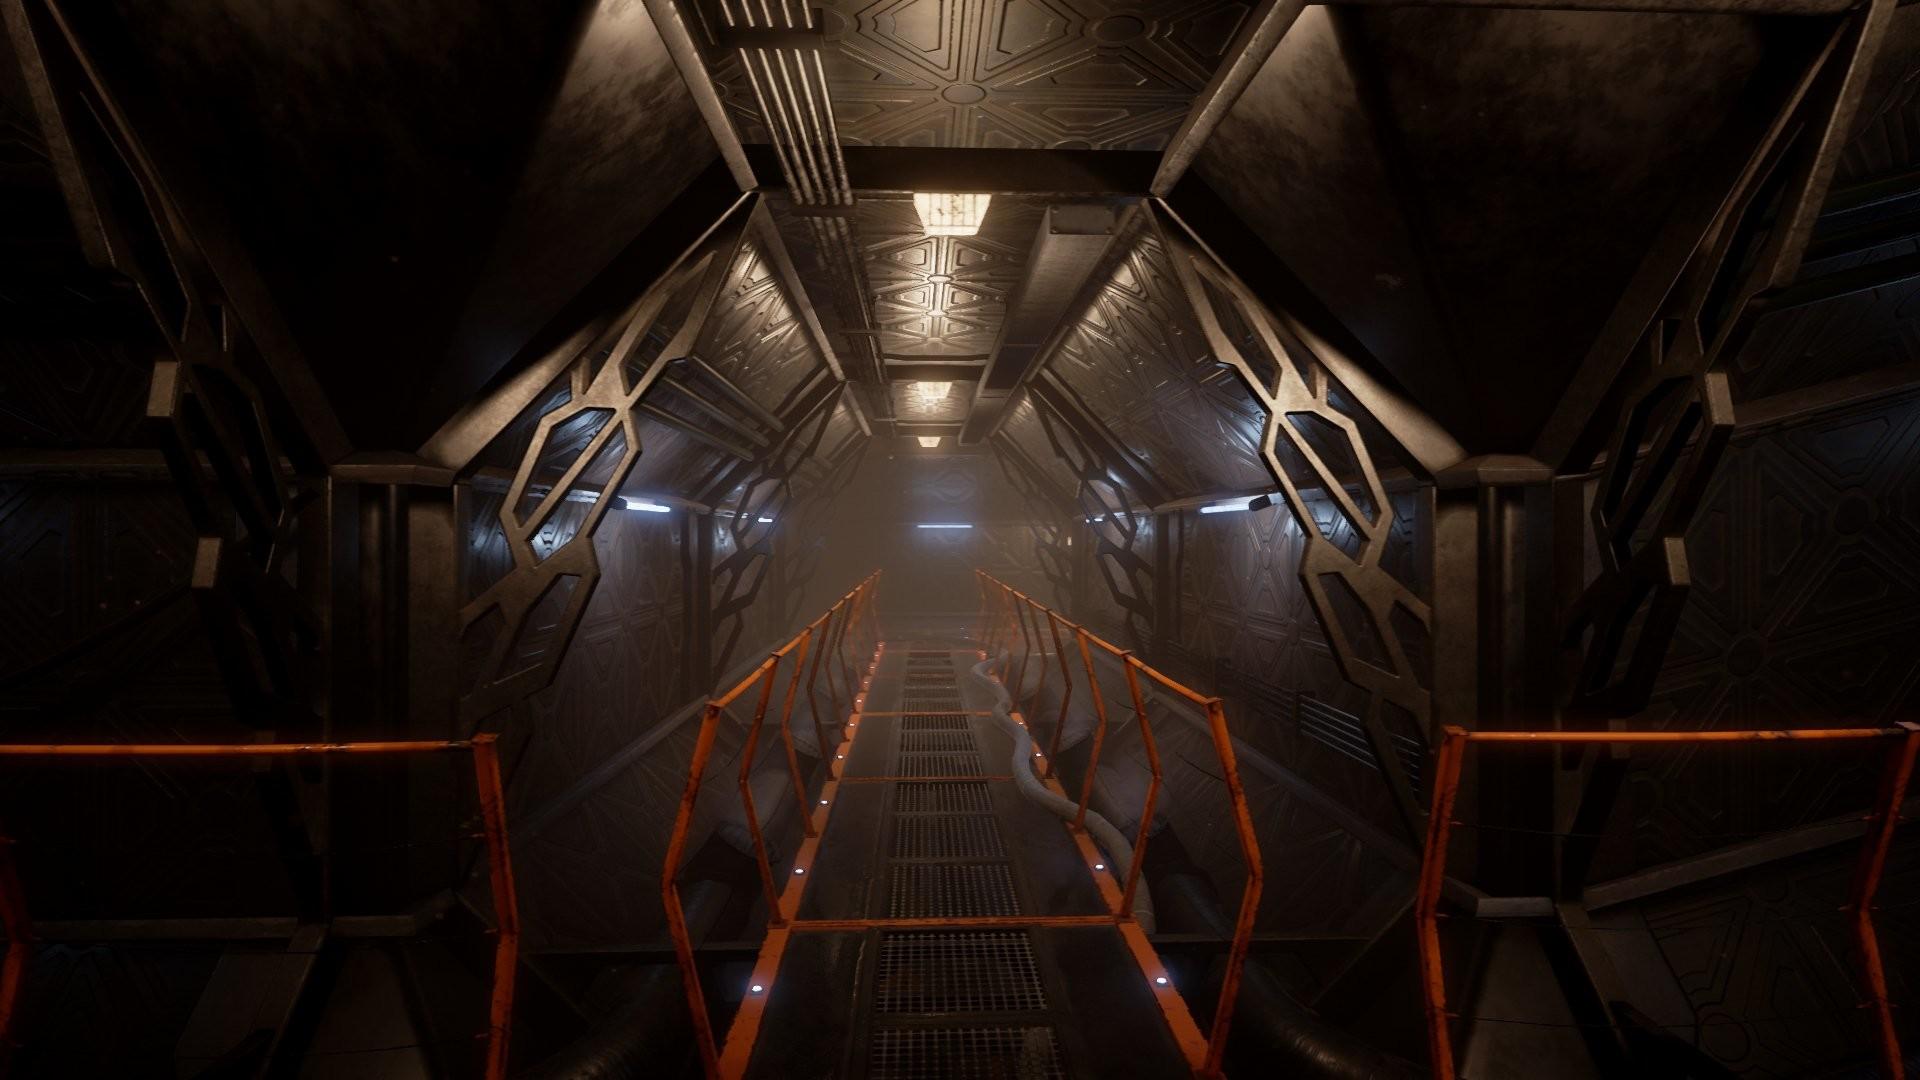 roman pivtoranis - sci-fi corridor environment